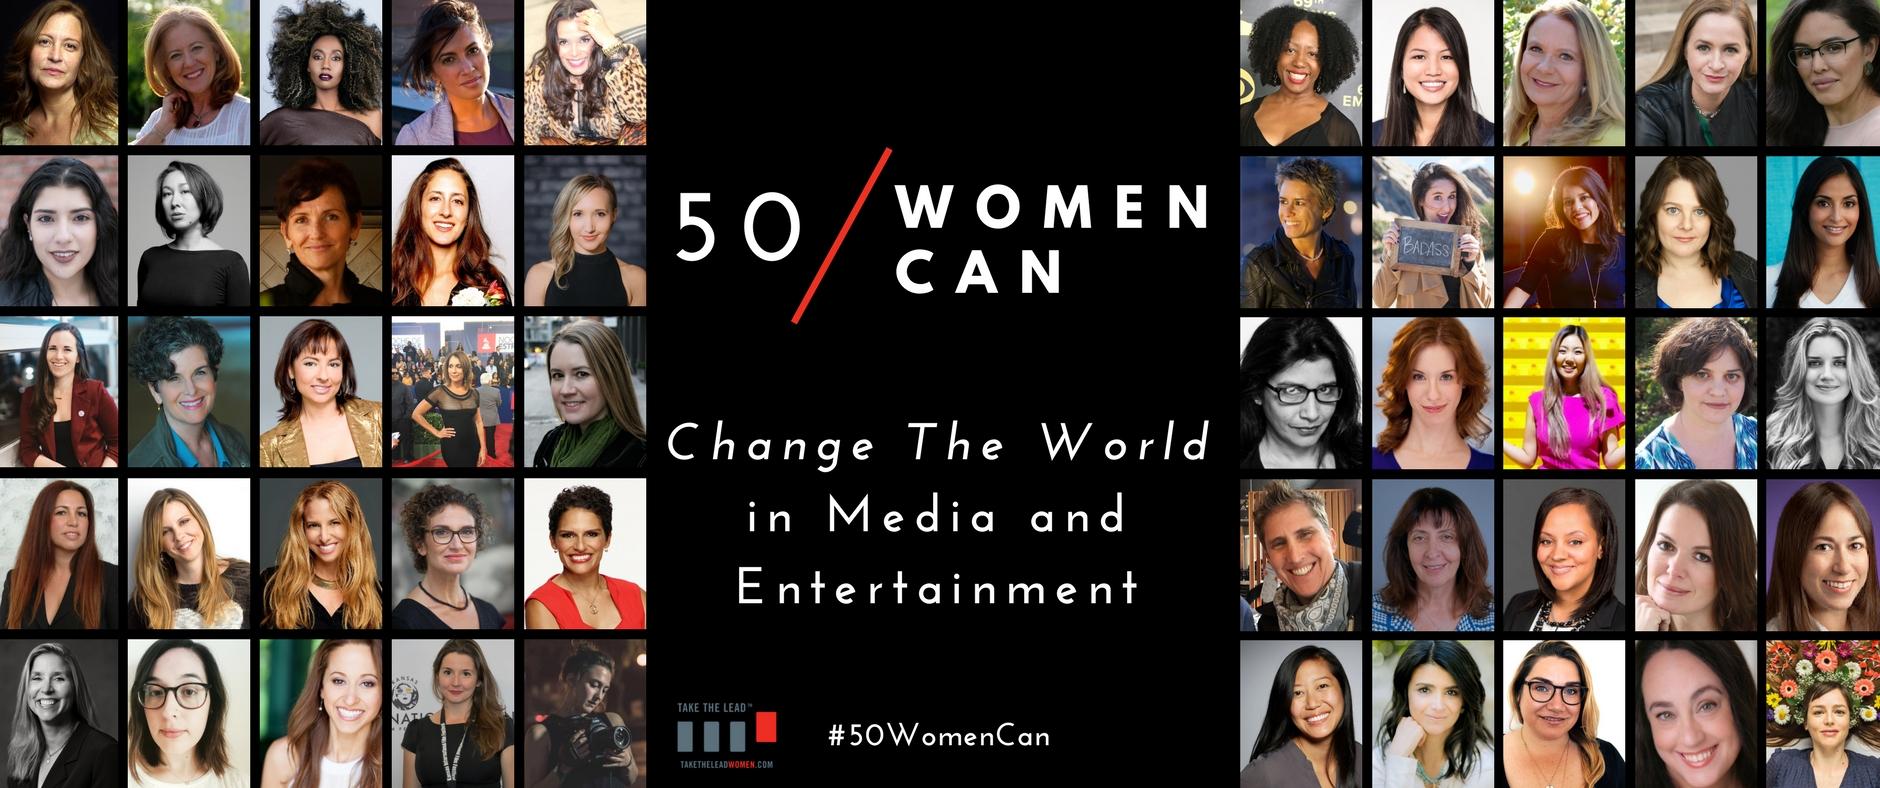 #50WomenCan